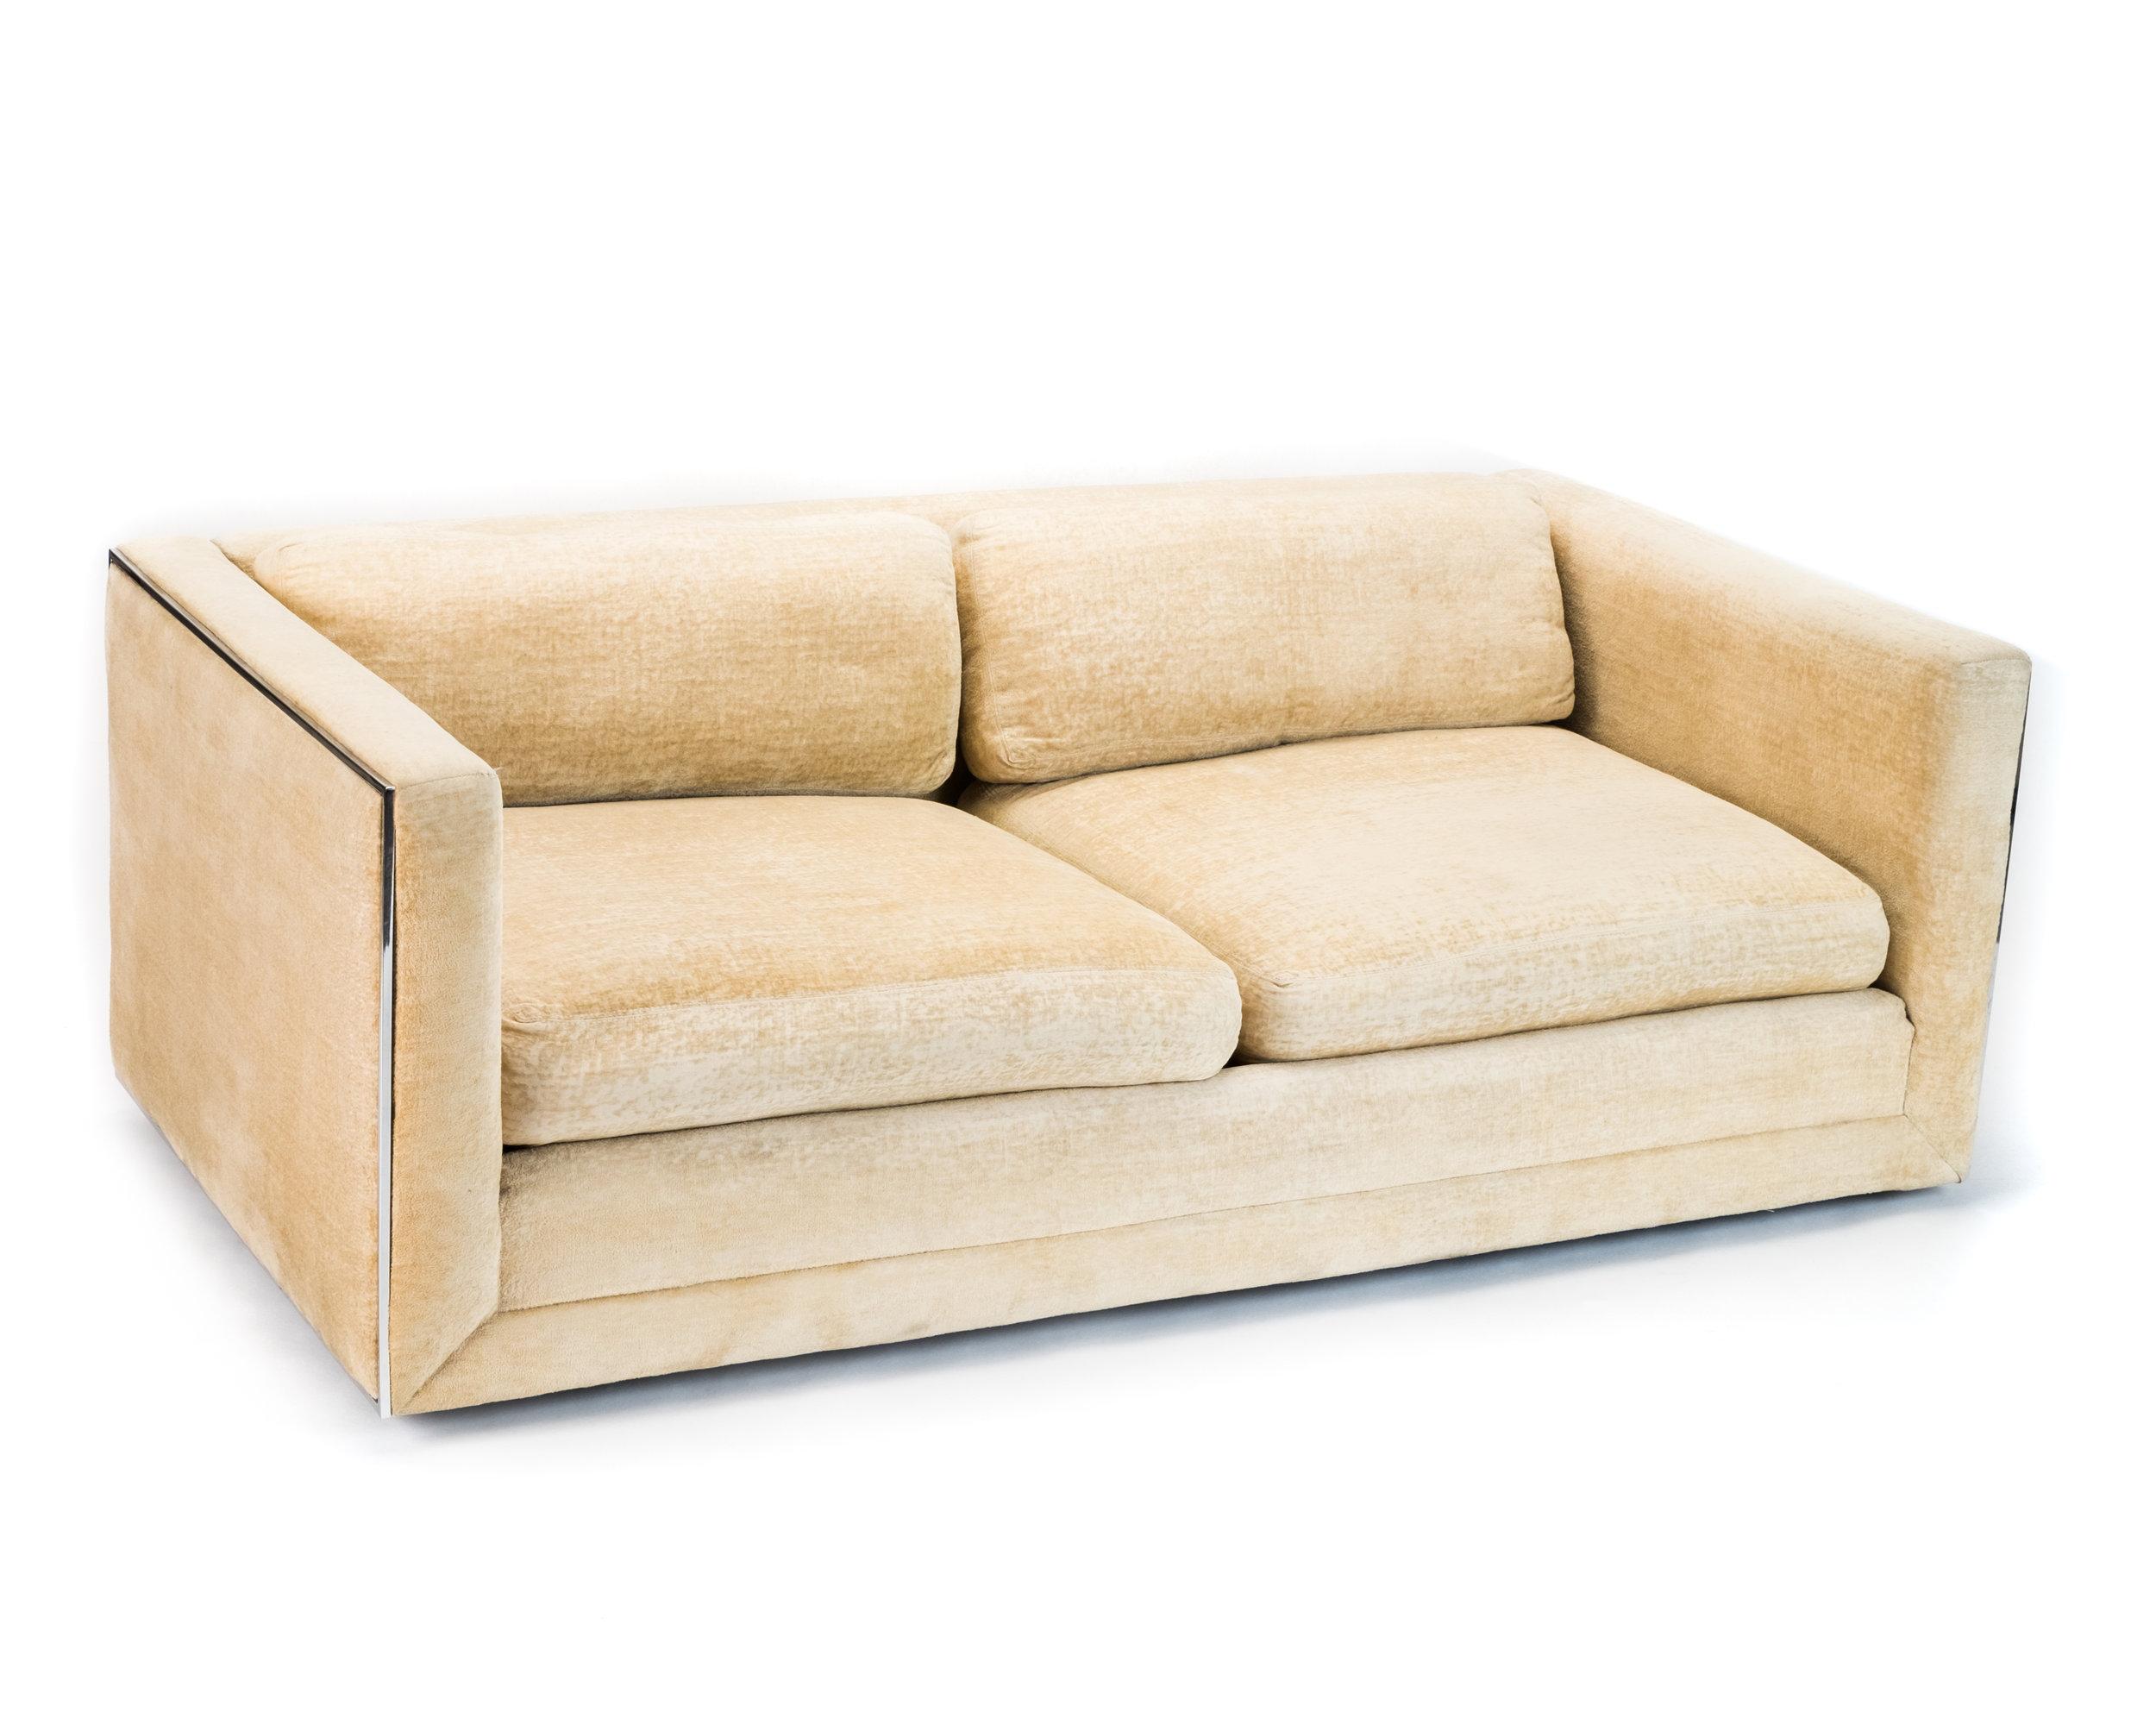 70s sofa durdham fabric chaise longue bed retro velvet 70 s hook props